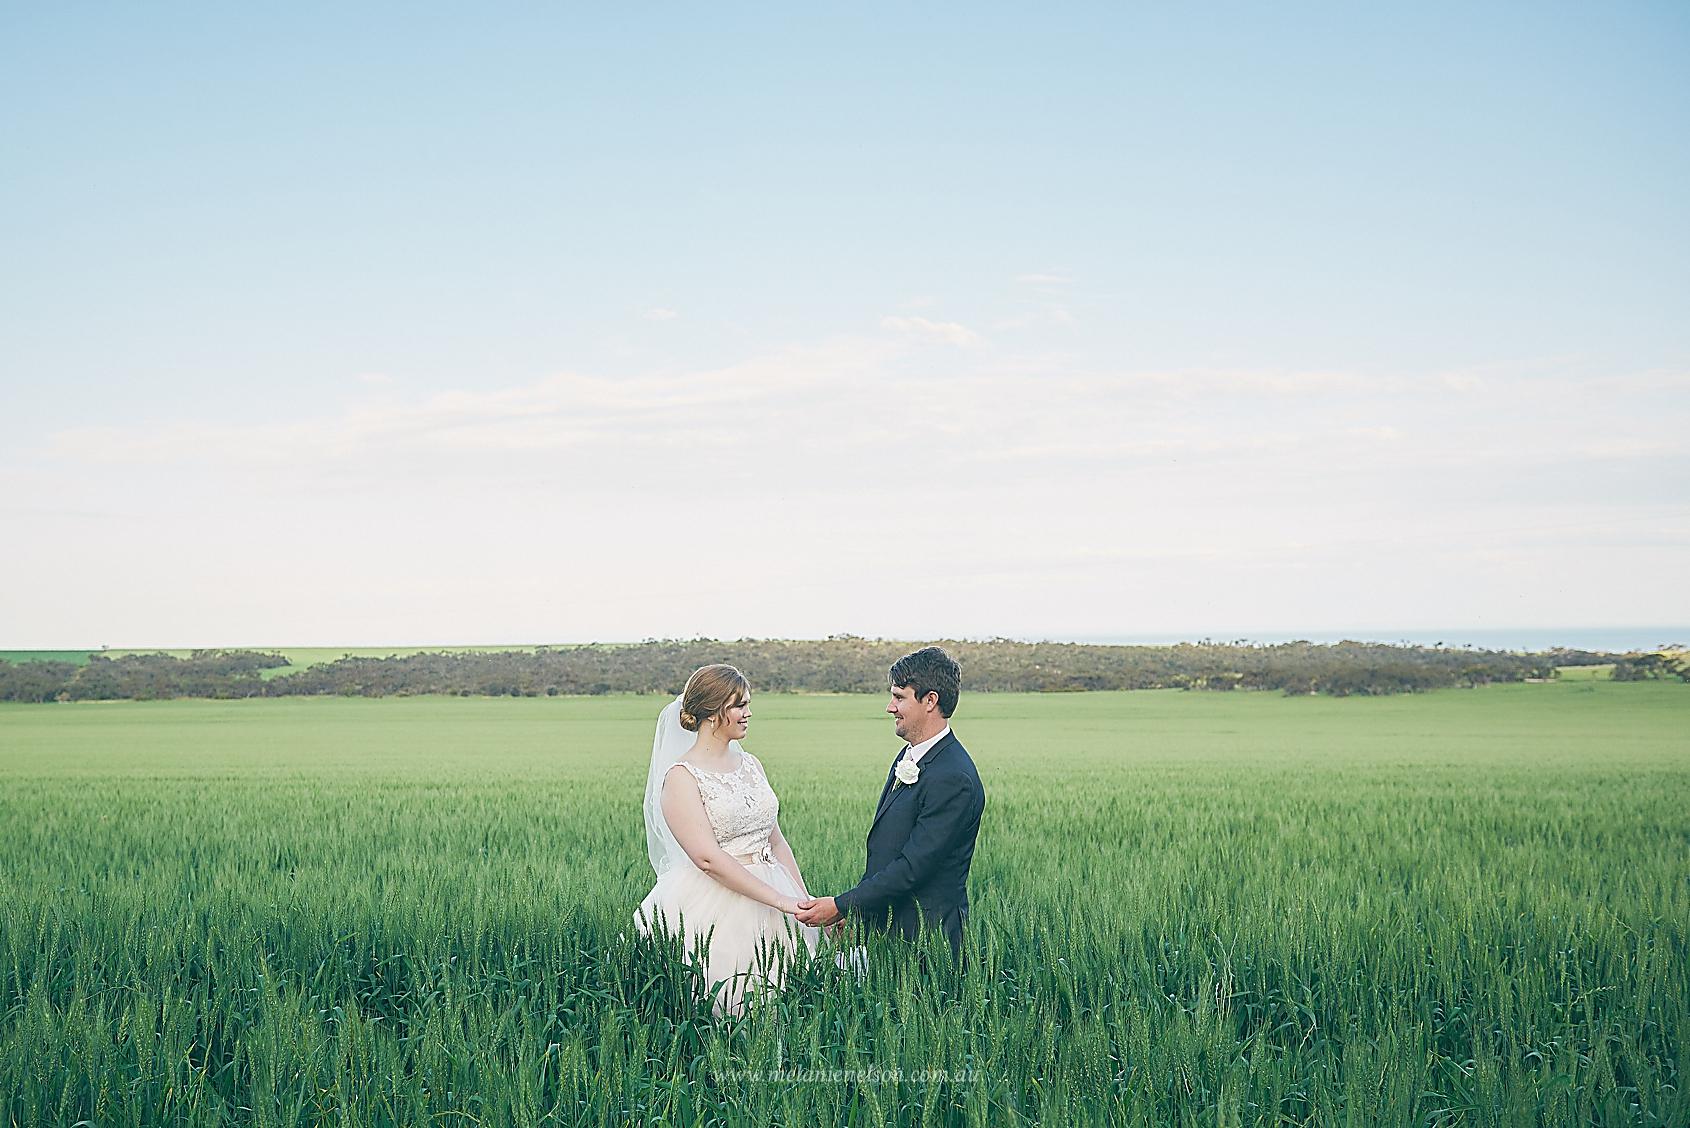 yorke_peninsula_wedding_photographer_0075.jpg